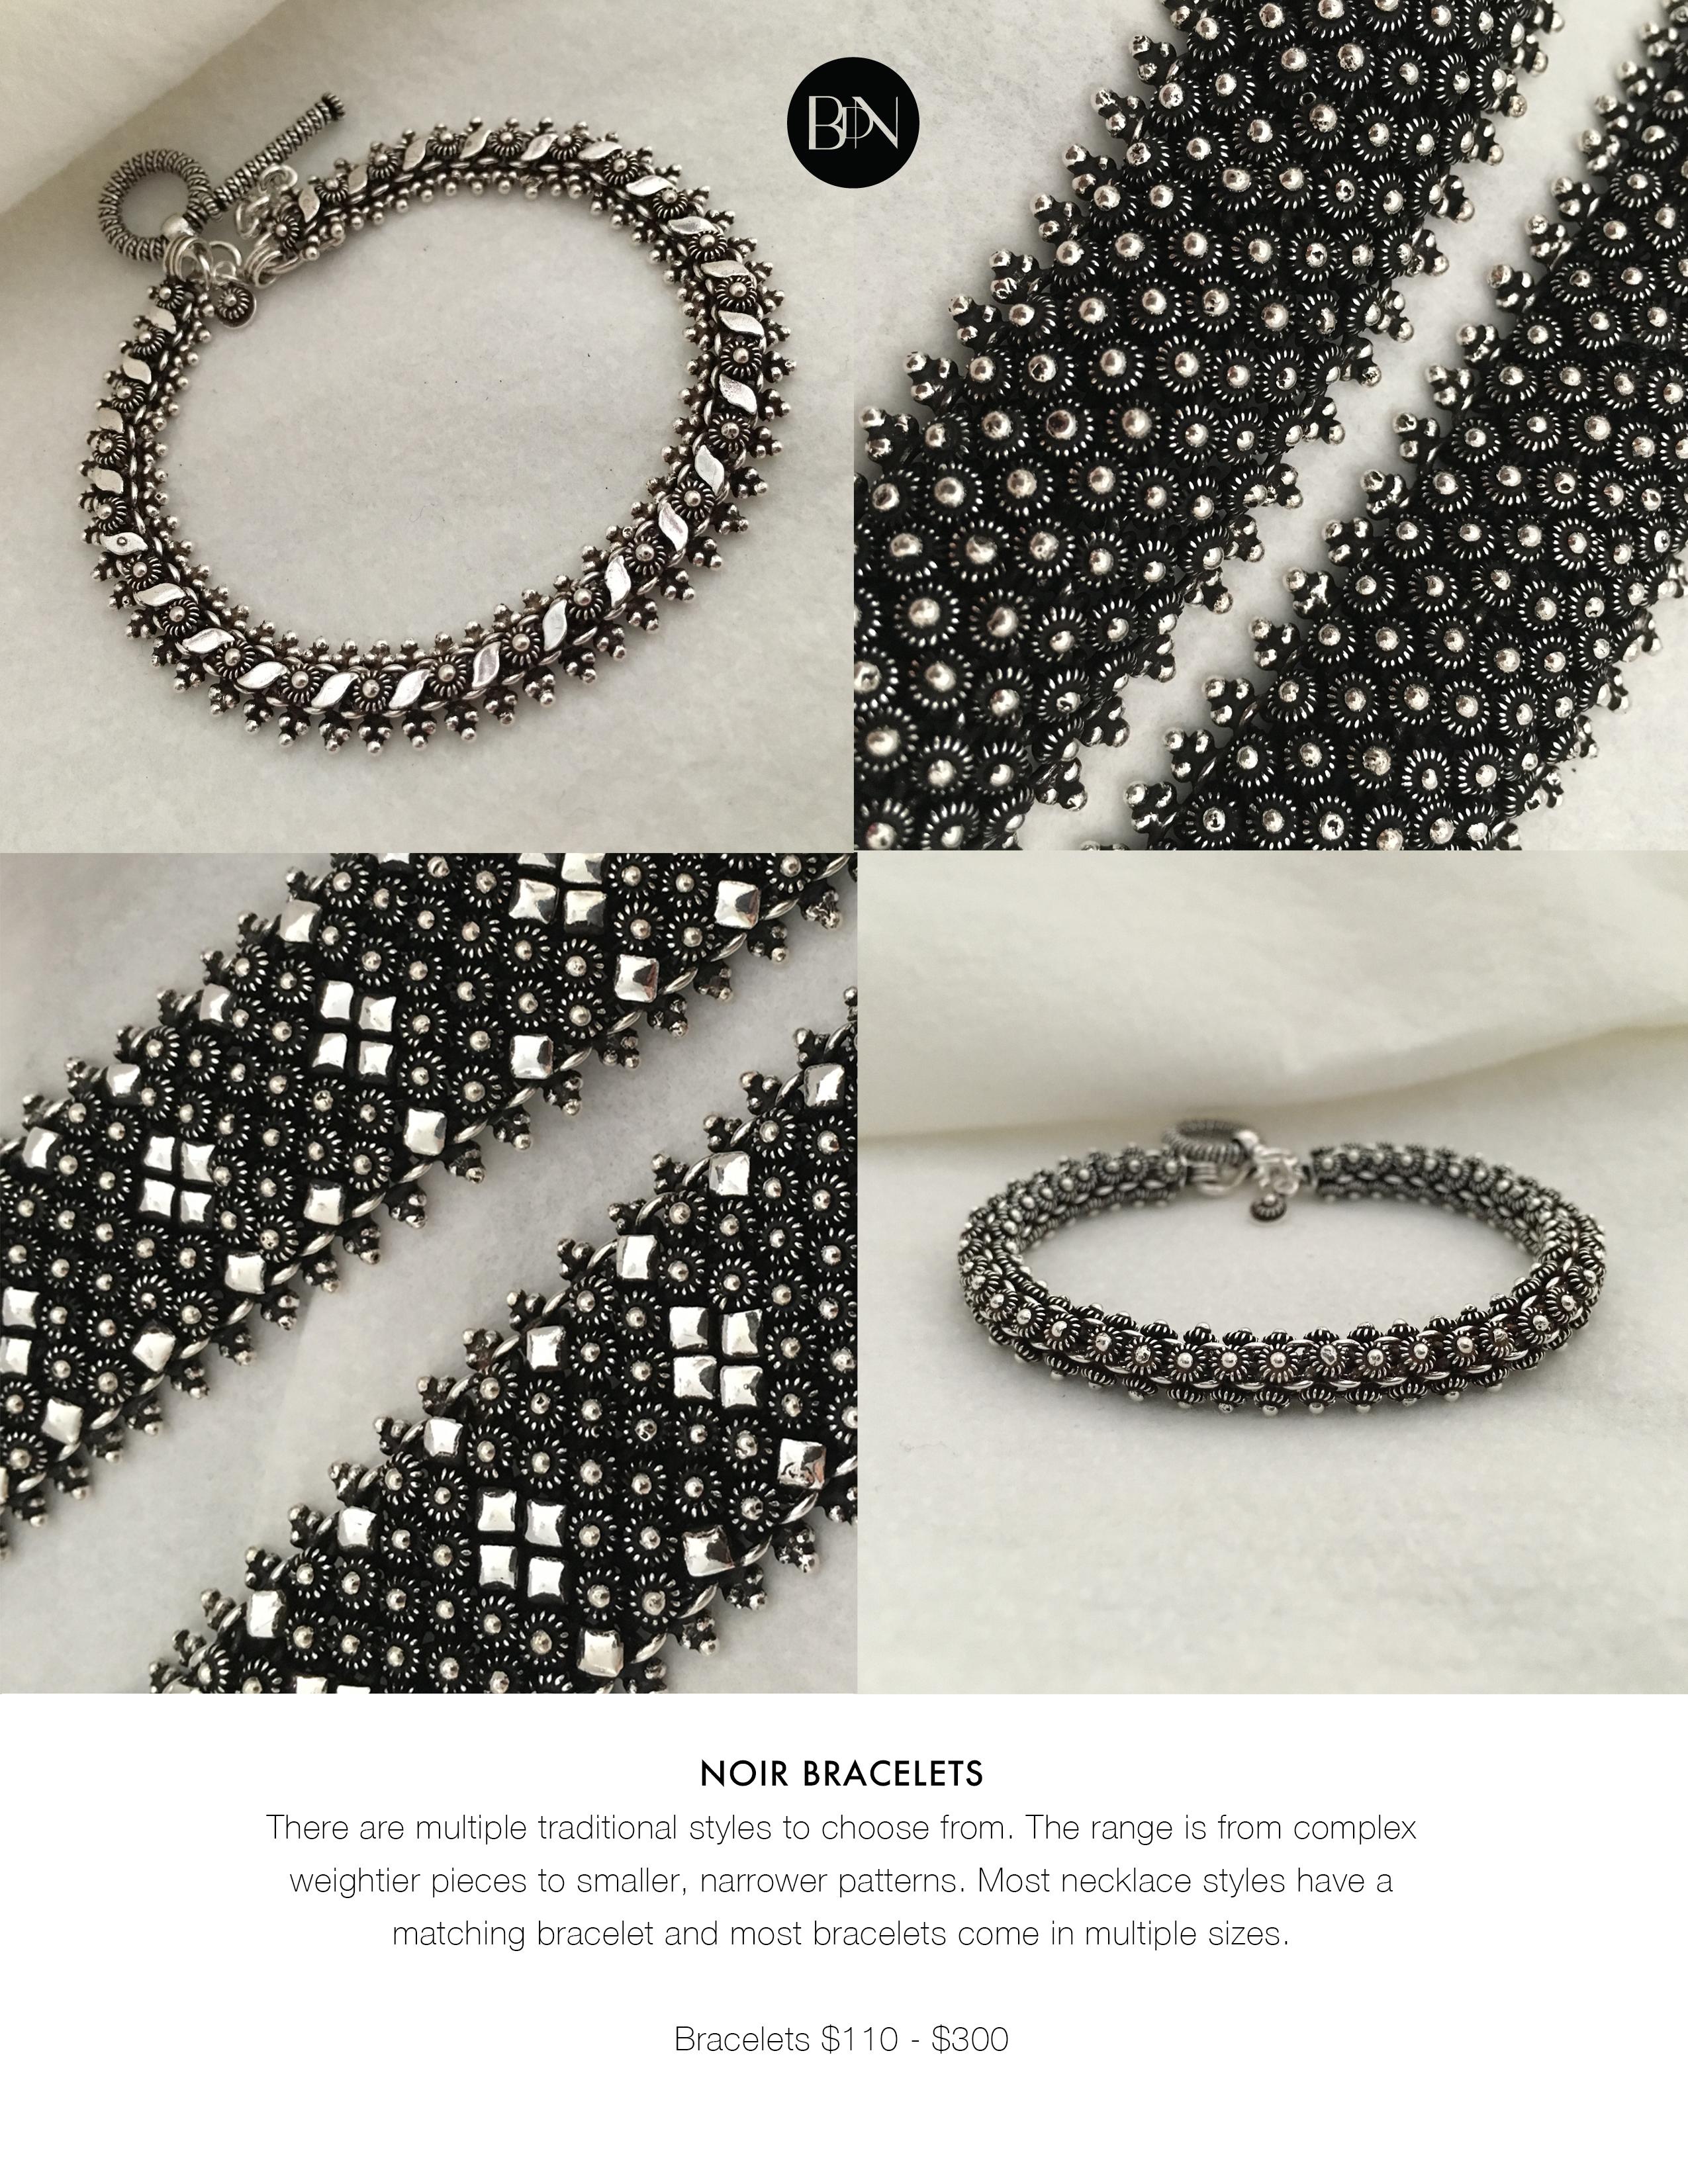 The Noir Collection - Bracelets I